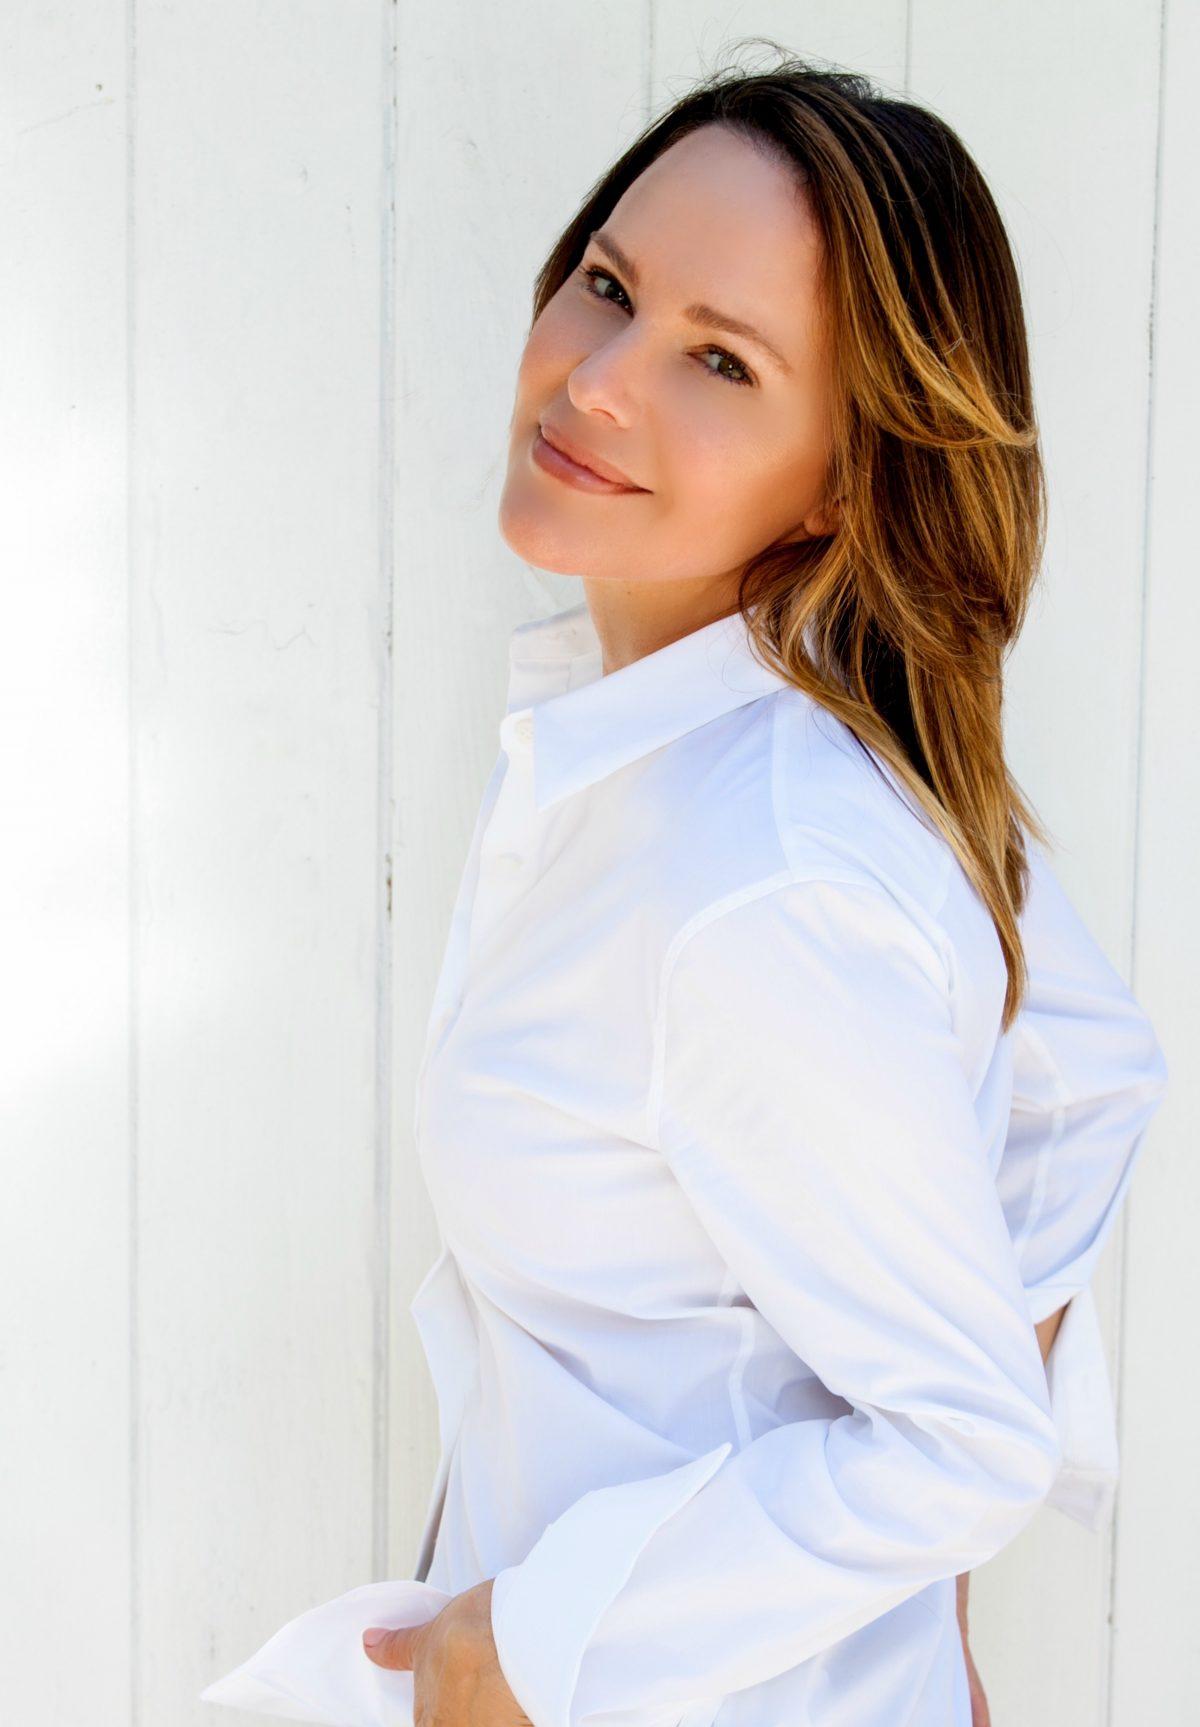 5 Rules For Life: Renata Helfman